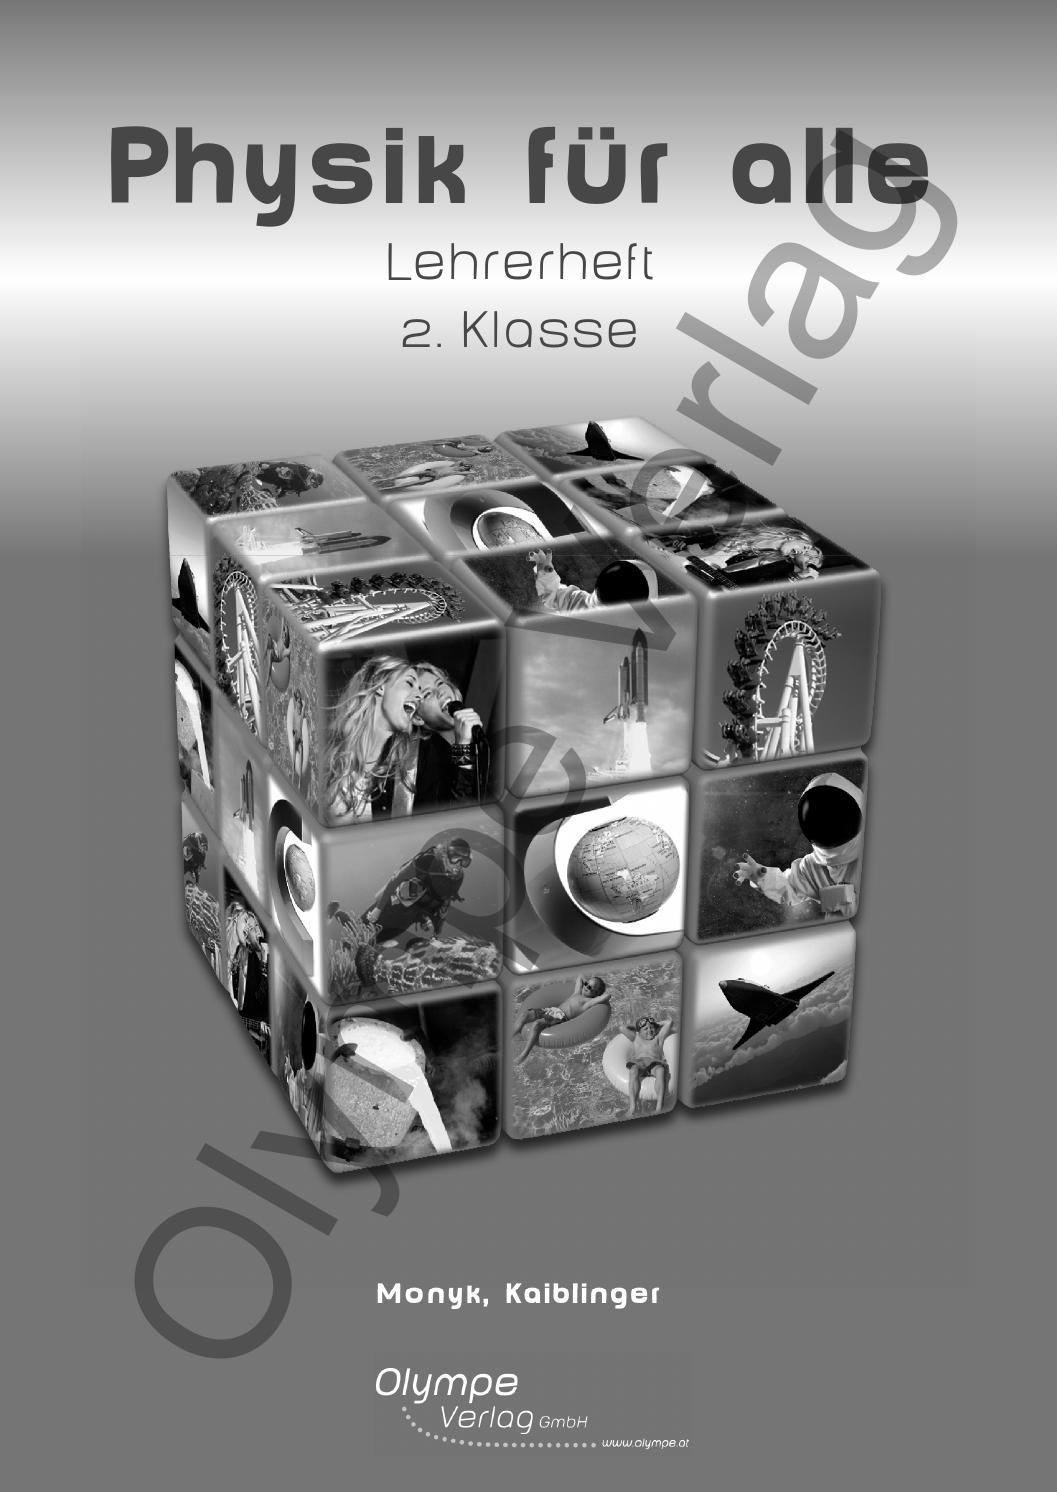 Ph2 lh by Olympe Verlag GmbH - issuu